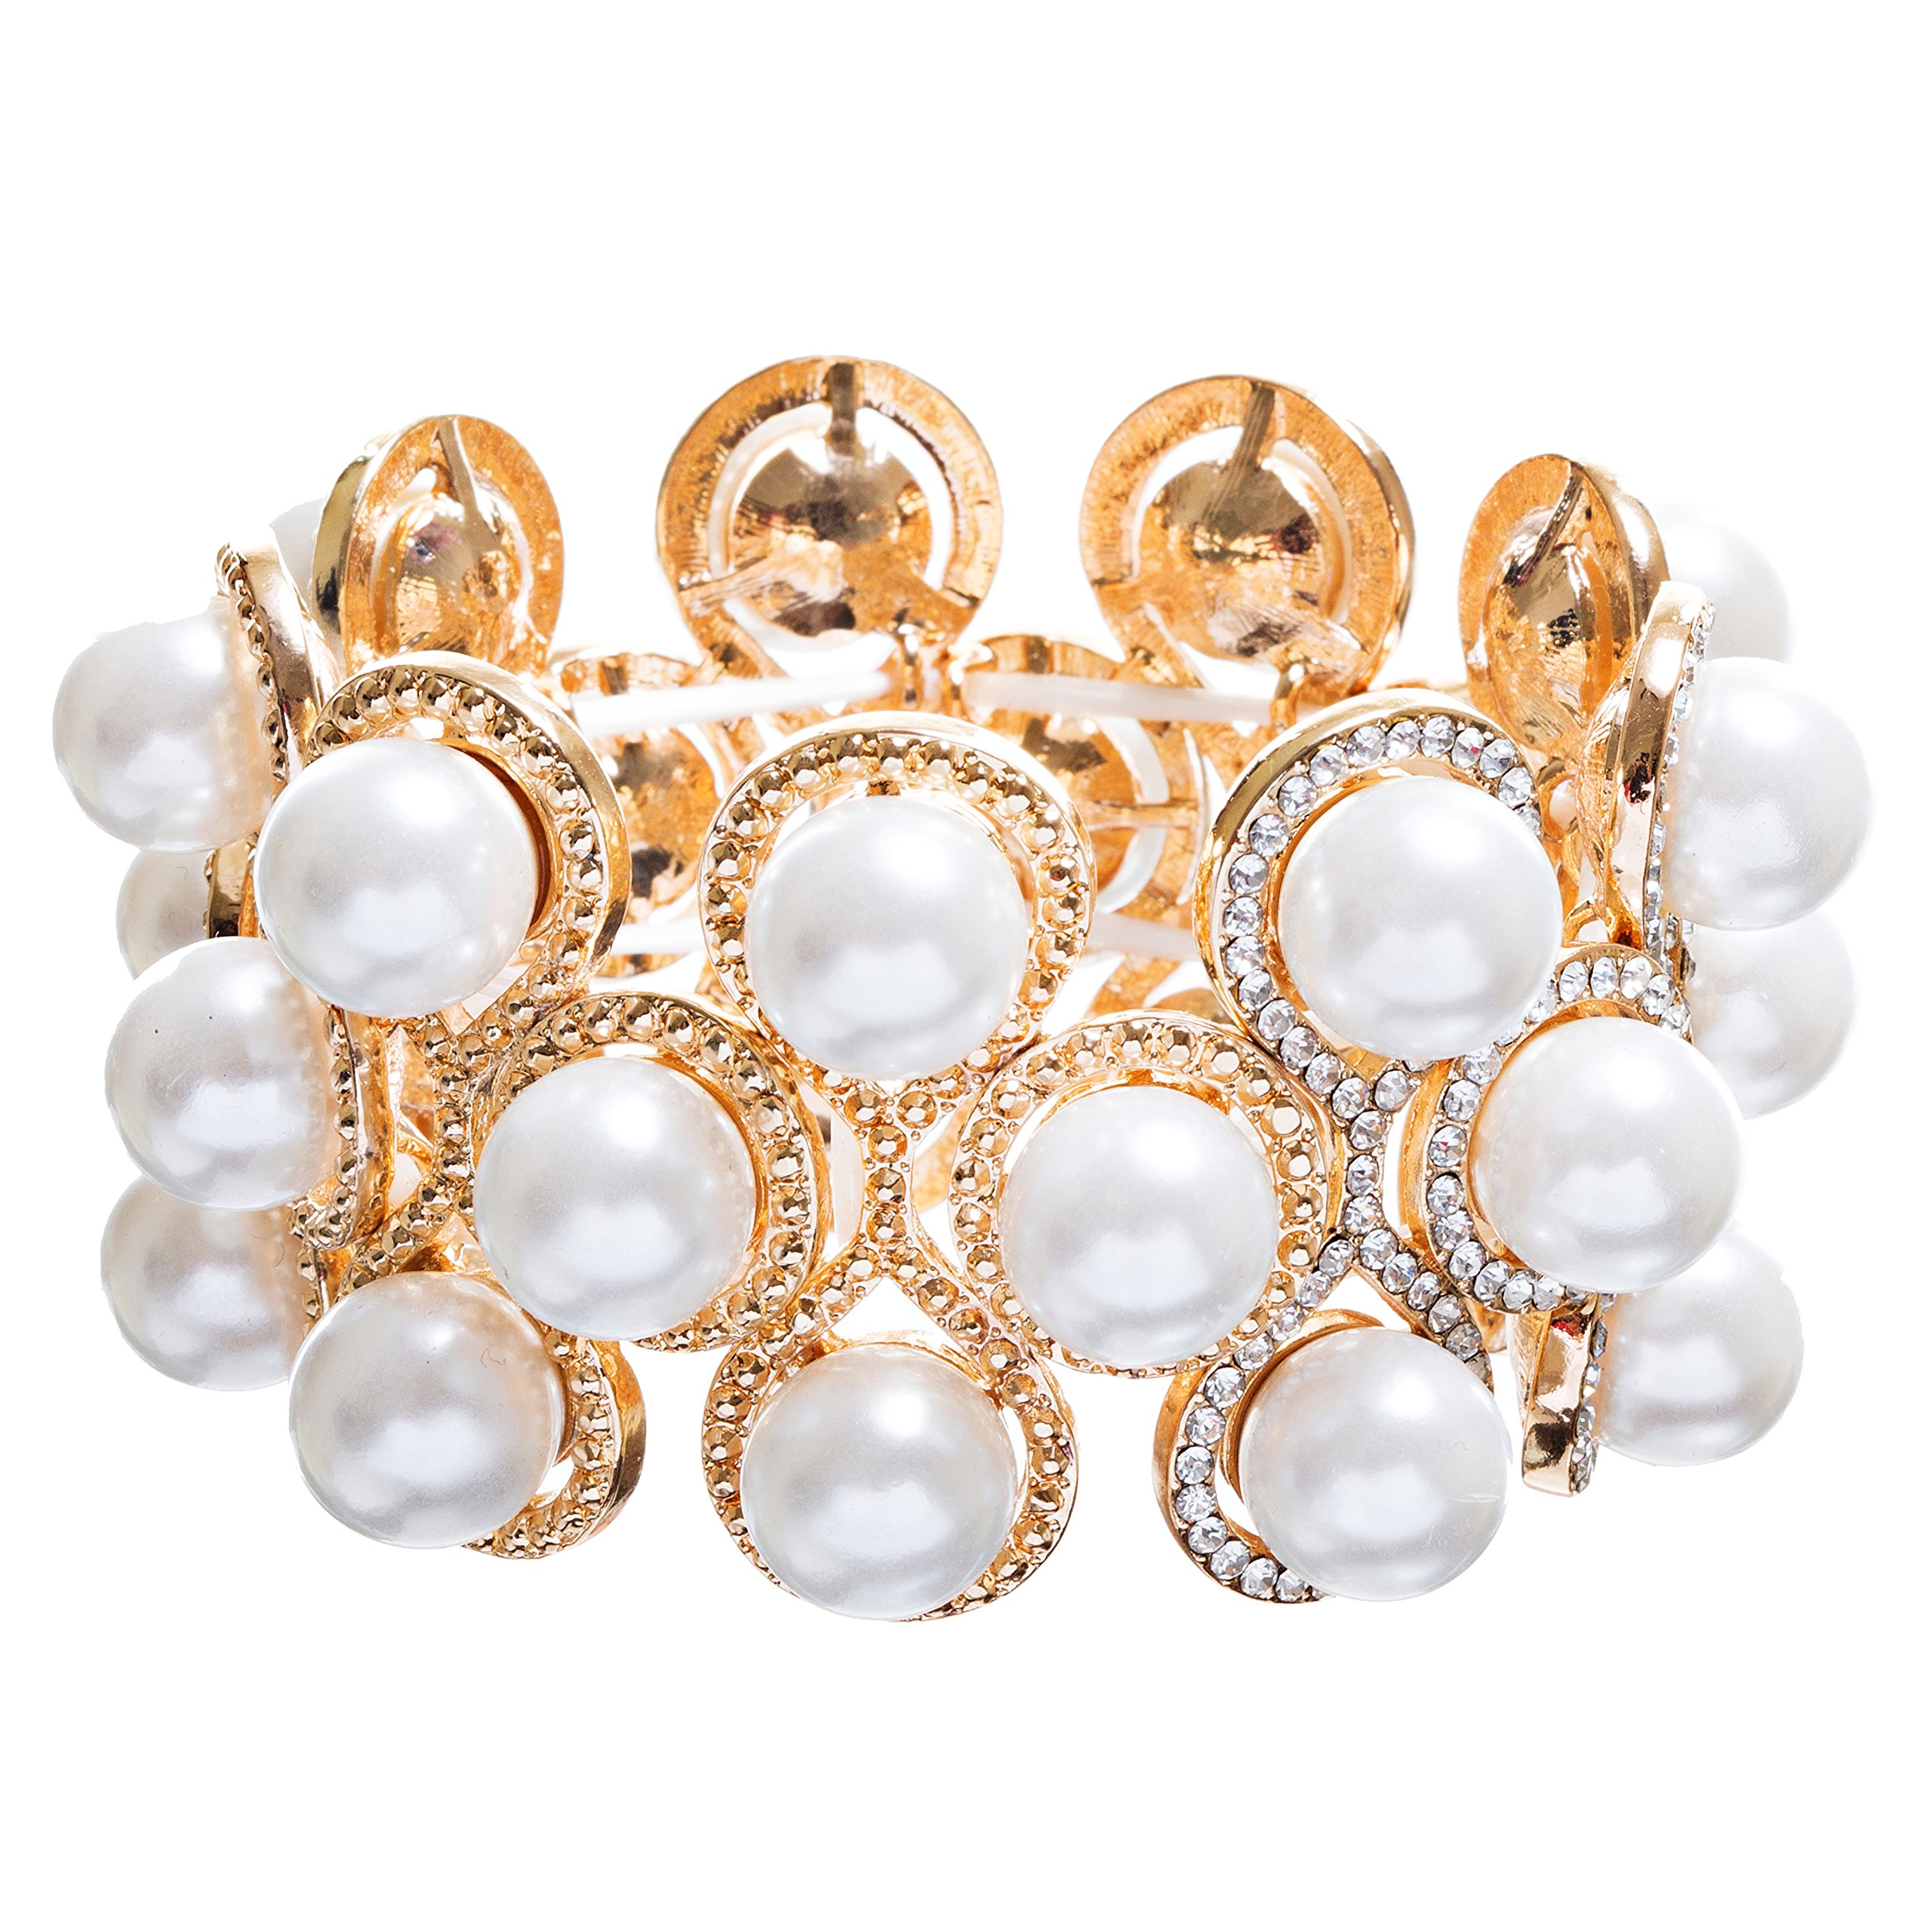 ACCESSORIESFOREVER Bridal Wedding Jewelry Crystal Rhinestone Impressive Faux Pearl Bracelet B499 Gold